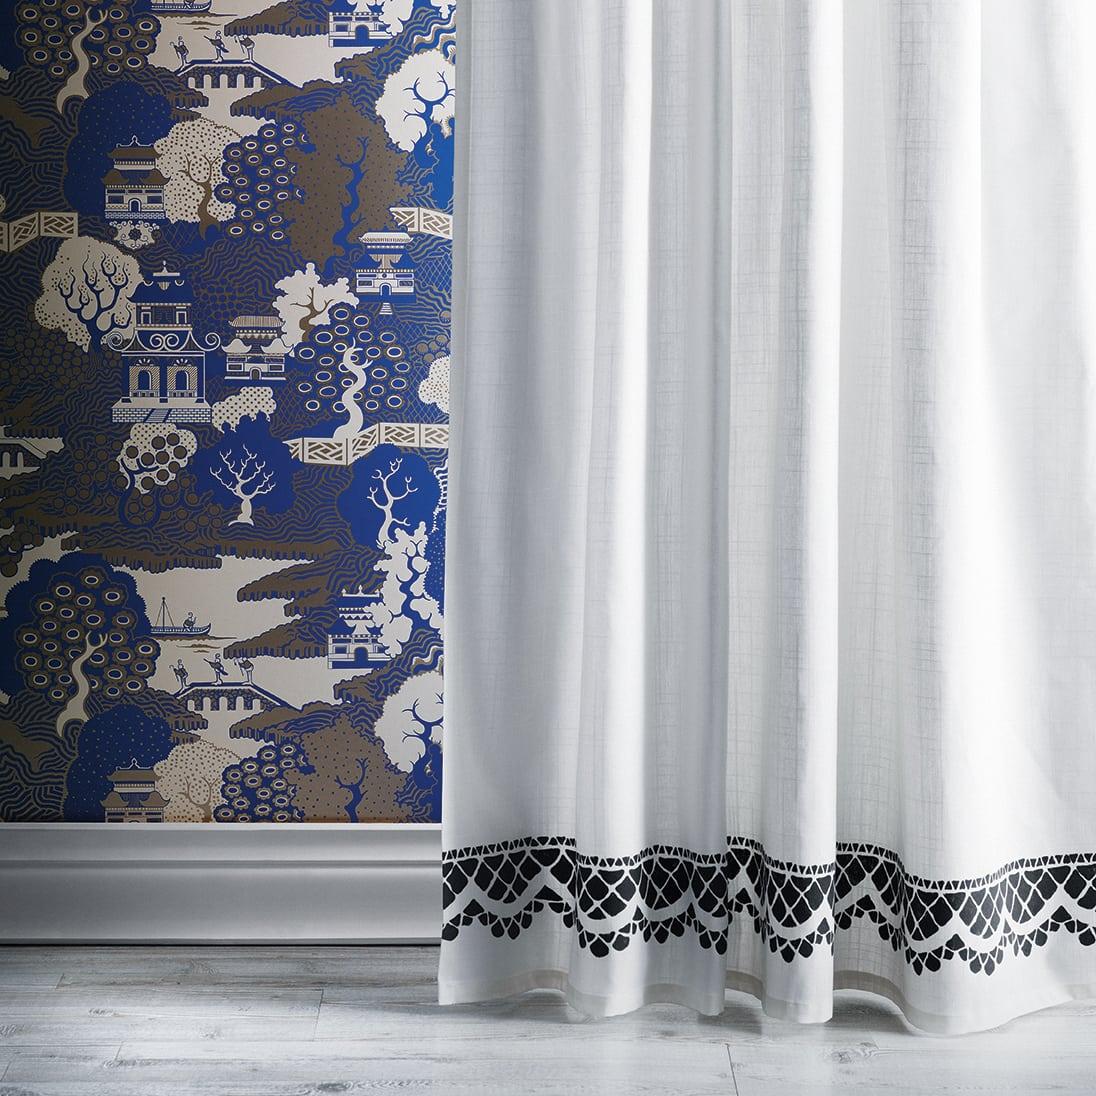 boehmian lace curtain trim